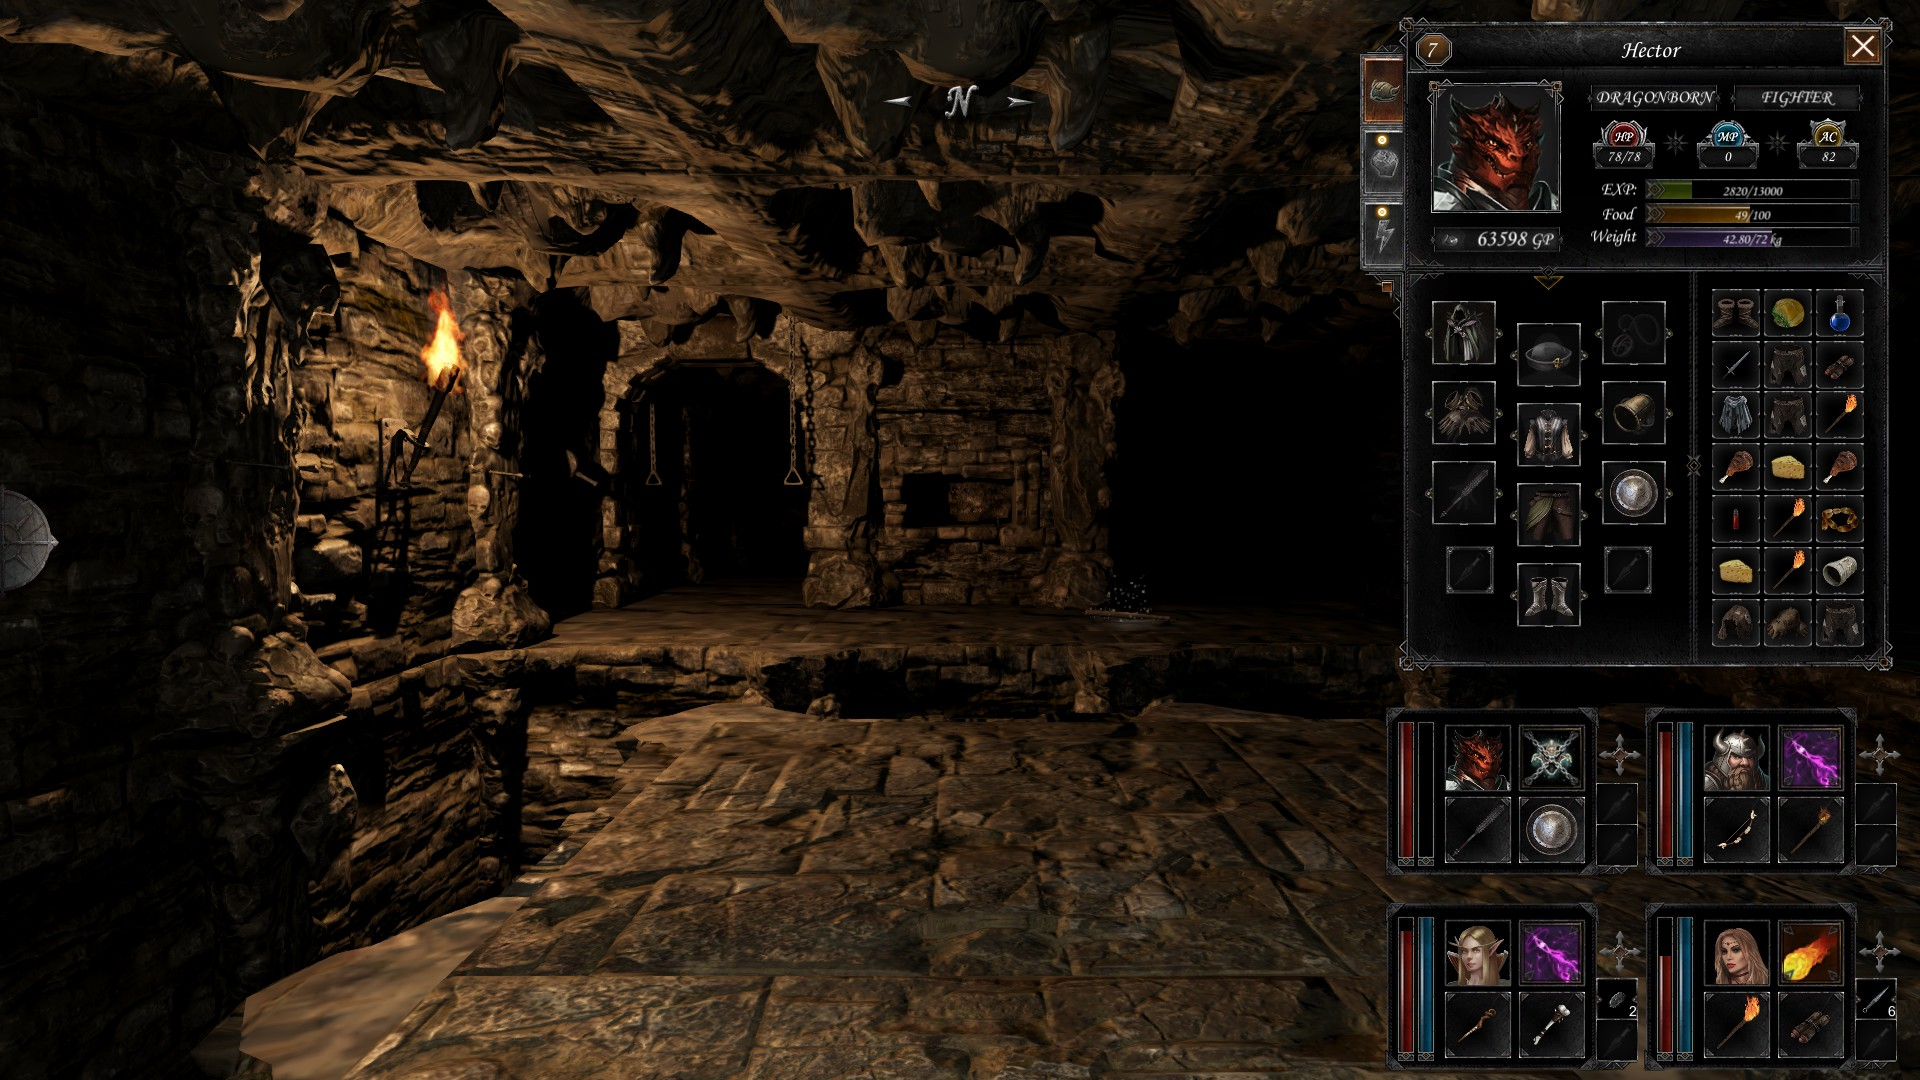 RPG old school : Dungeon Master, Eye Of Beholder, Grimrock.. - Page 7 Ss_809f645256b819939c29cedbd3e9b33a3870eefc.1920x1080